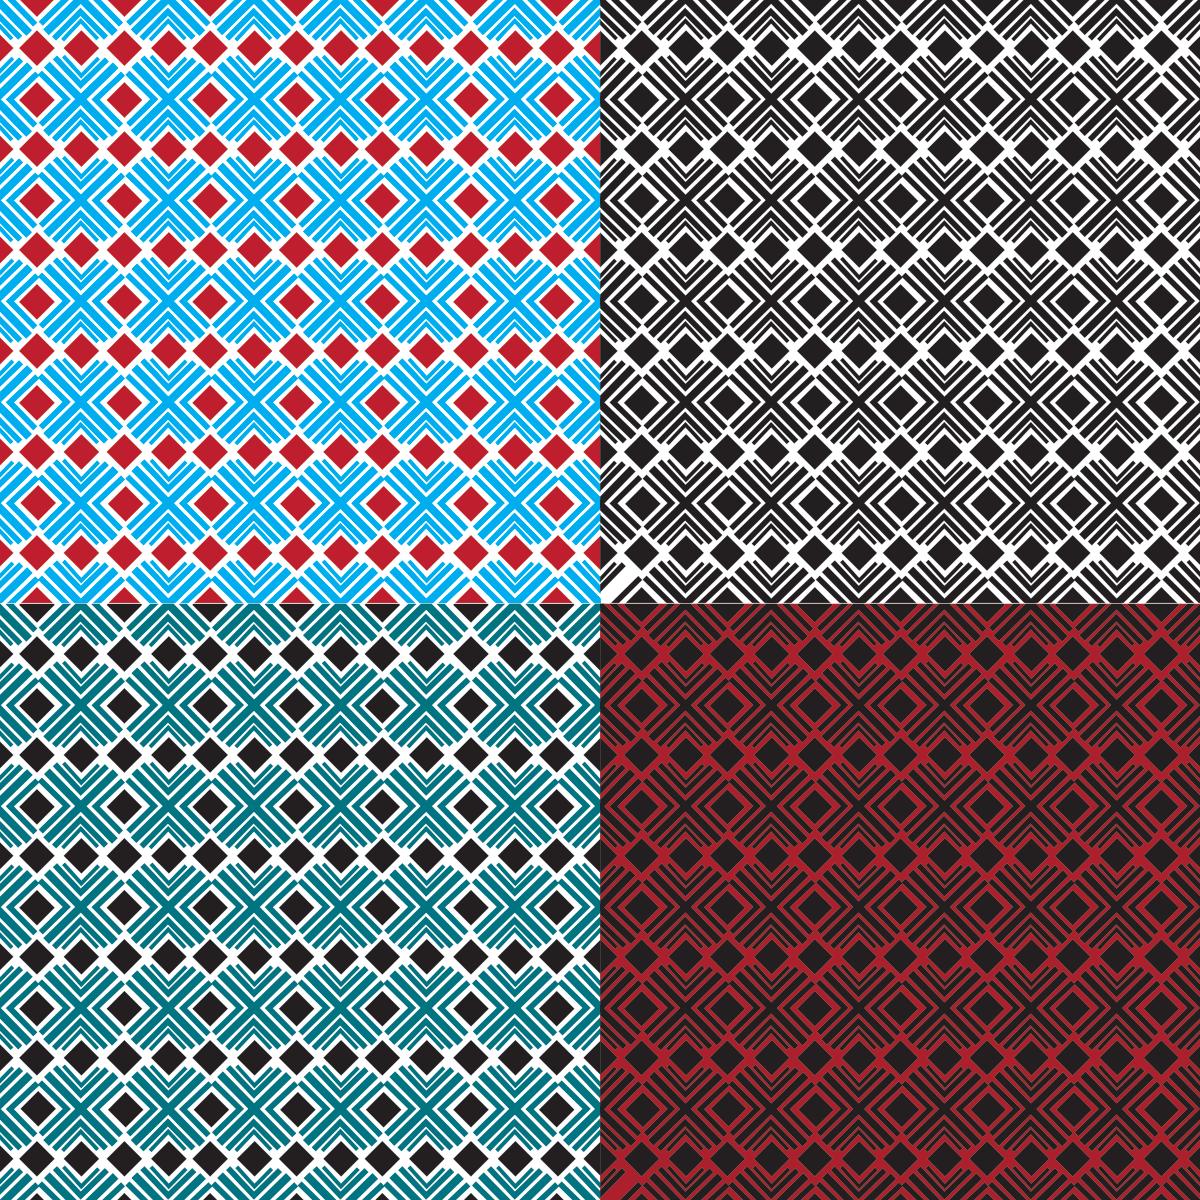 Pattern 38